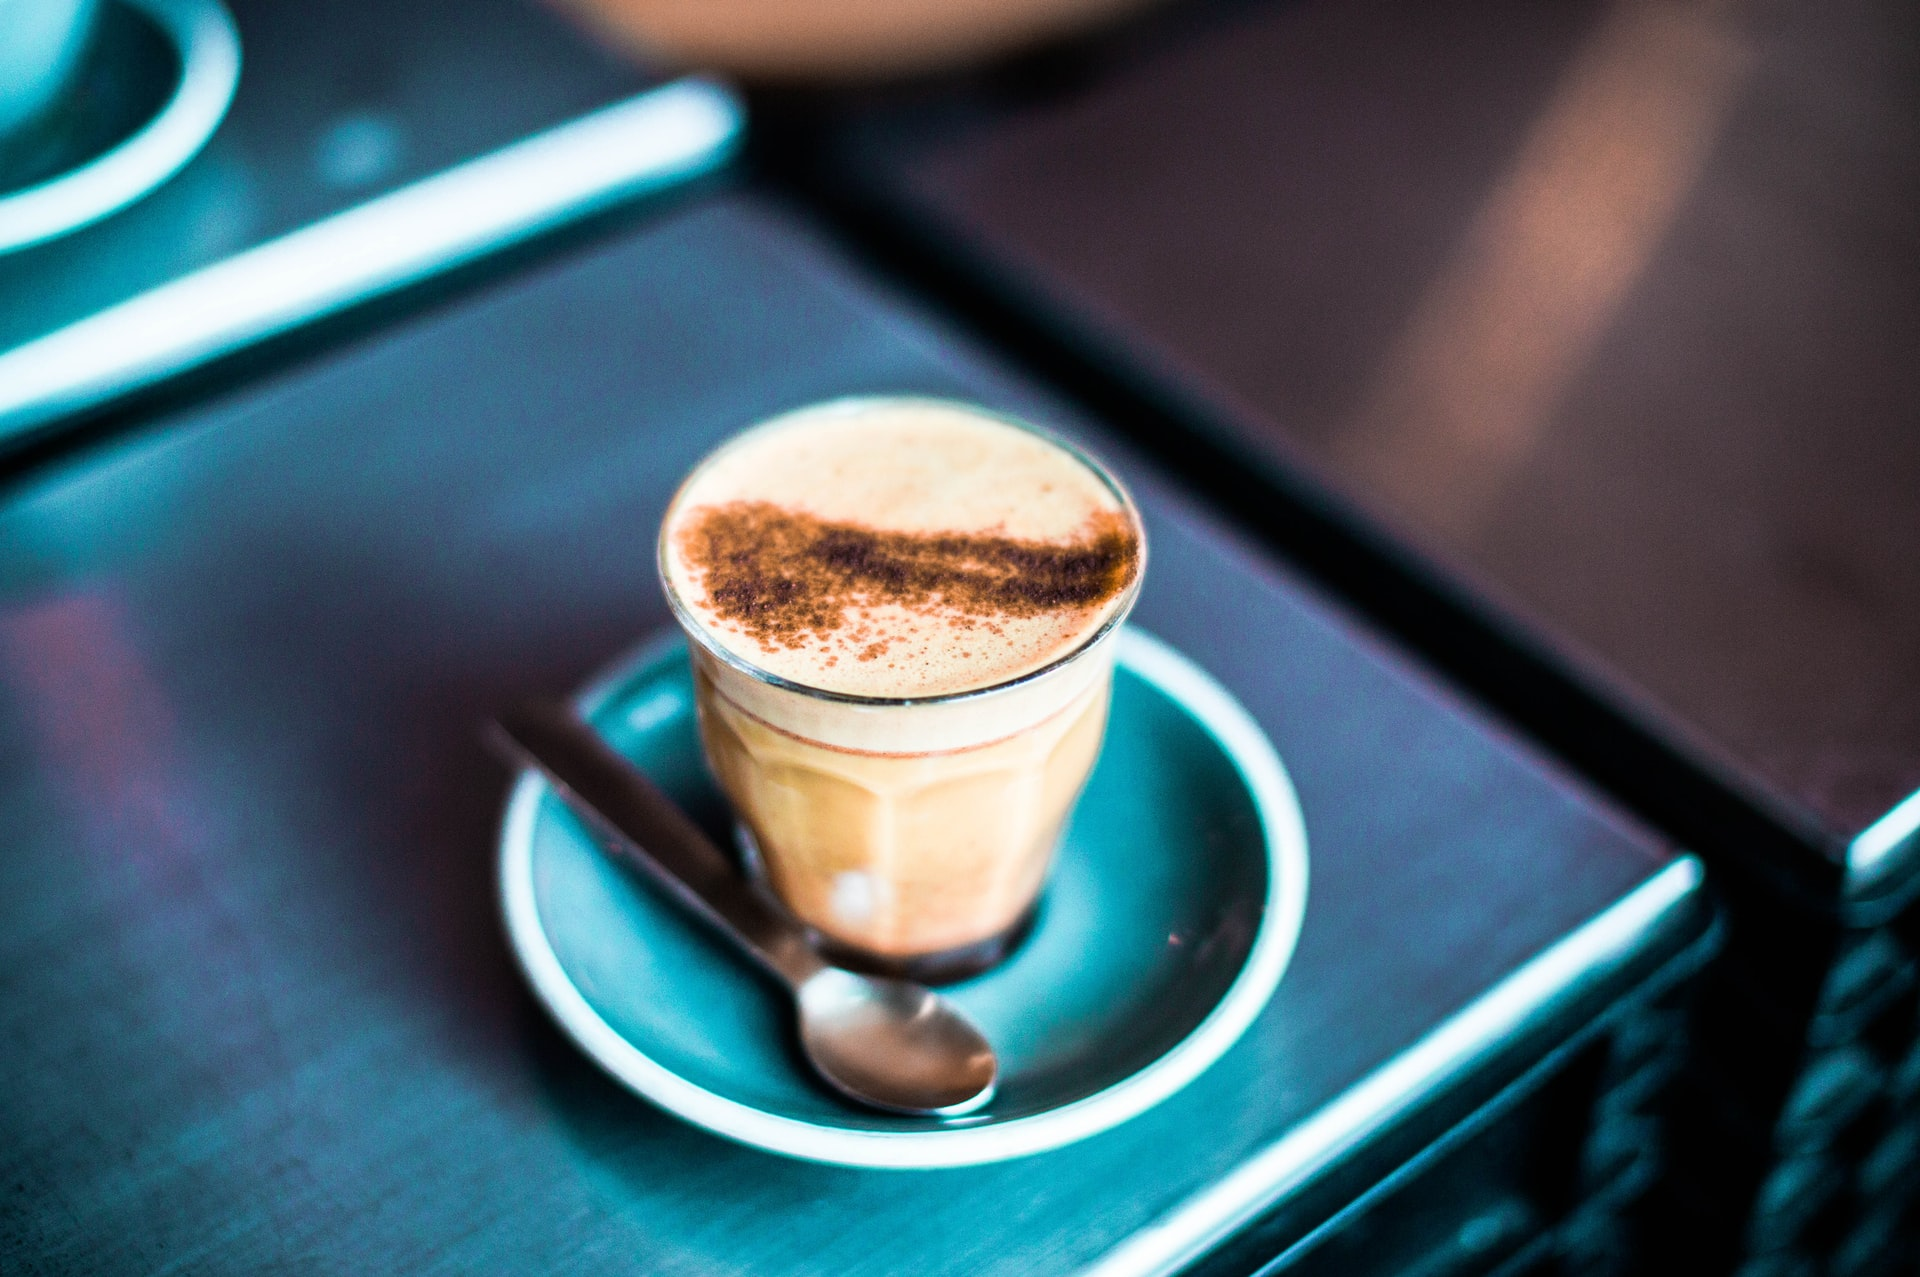 Now Open Near The Kensington: Phin Coffee House